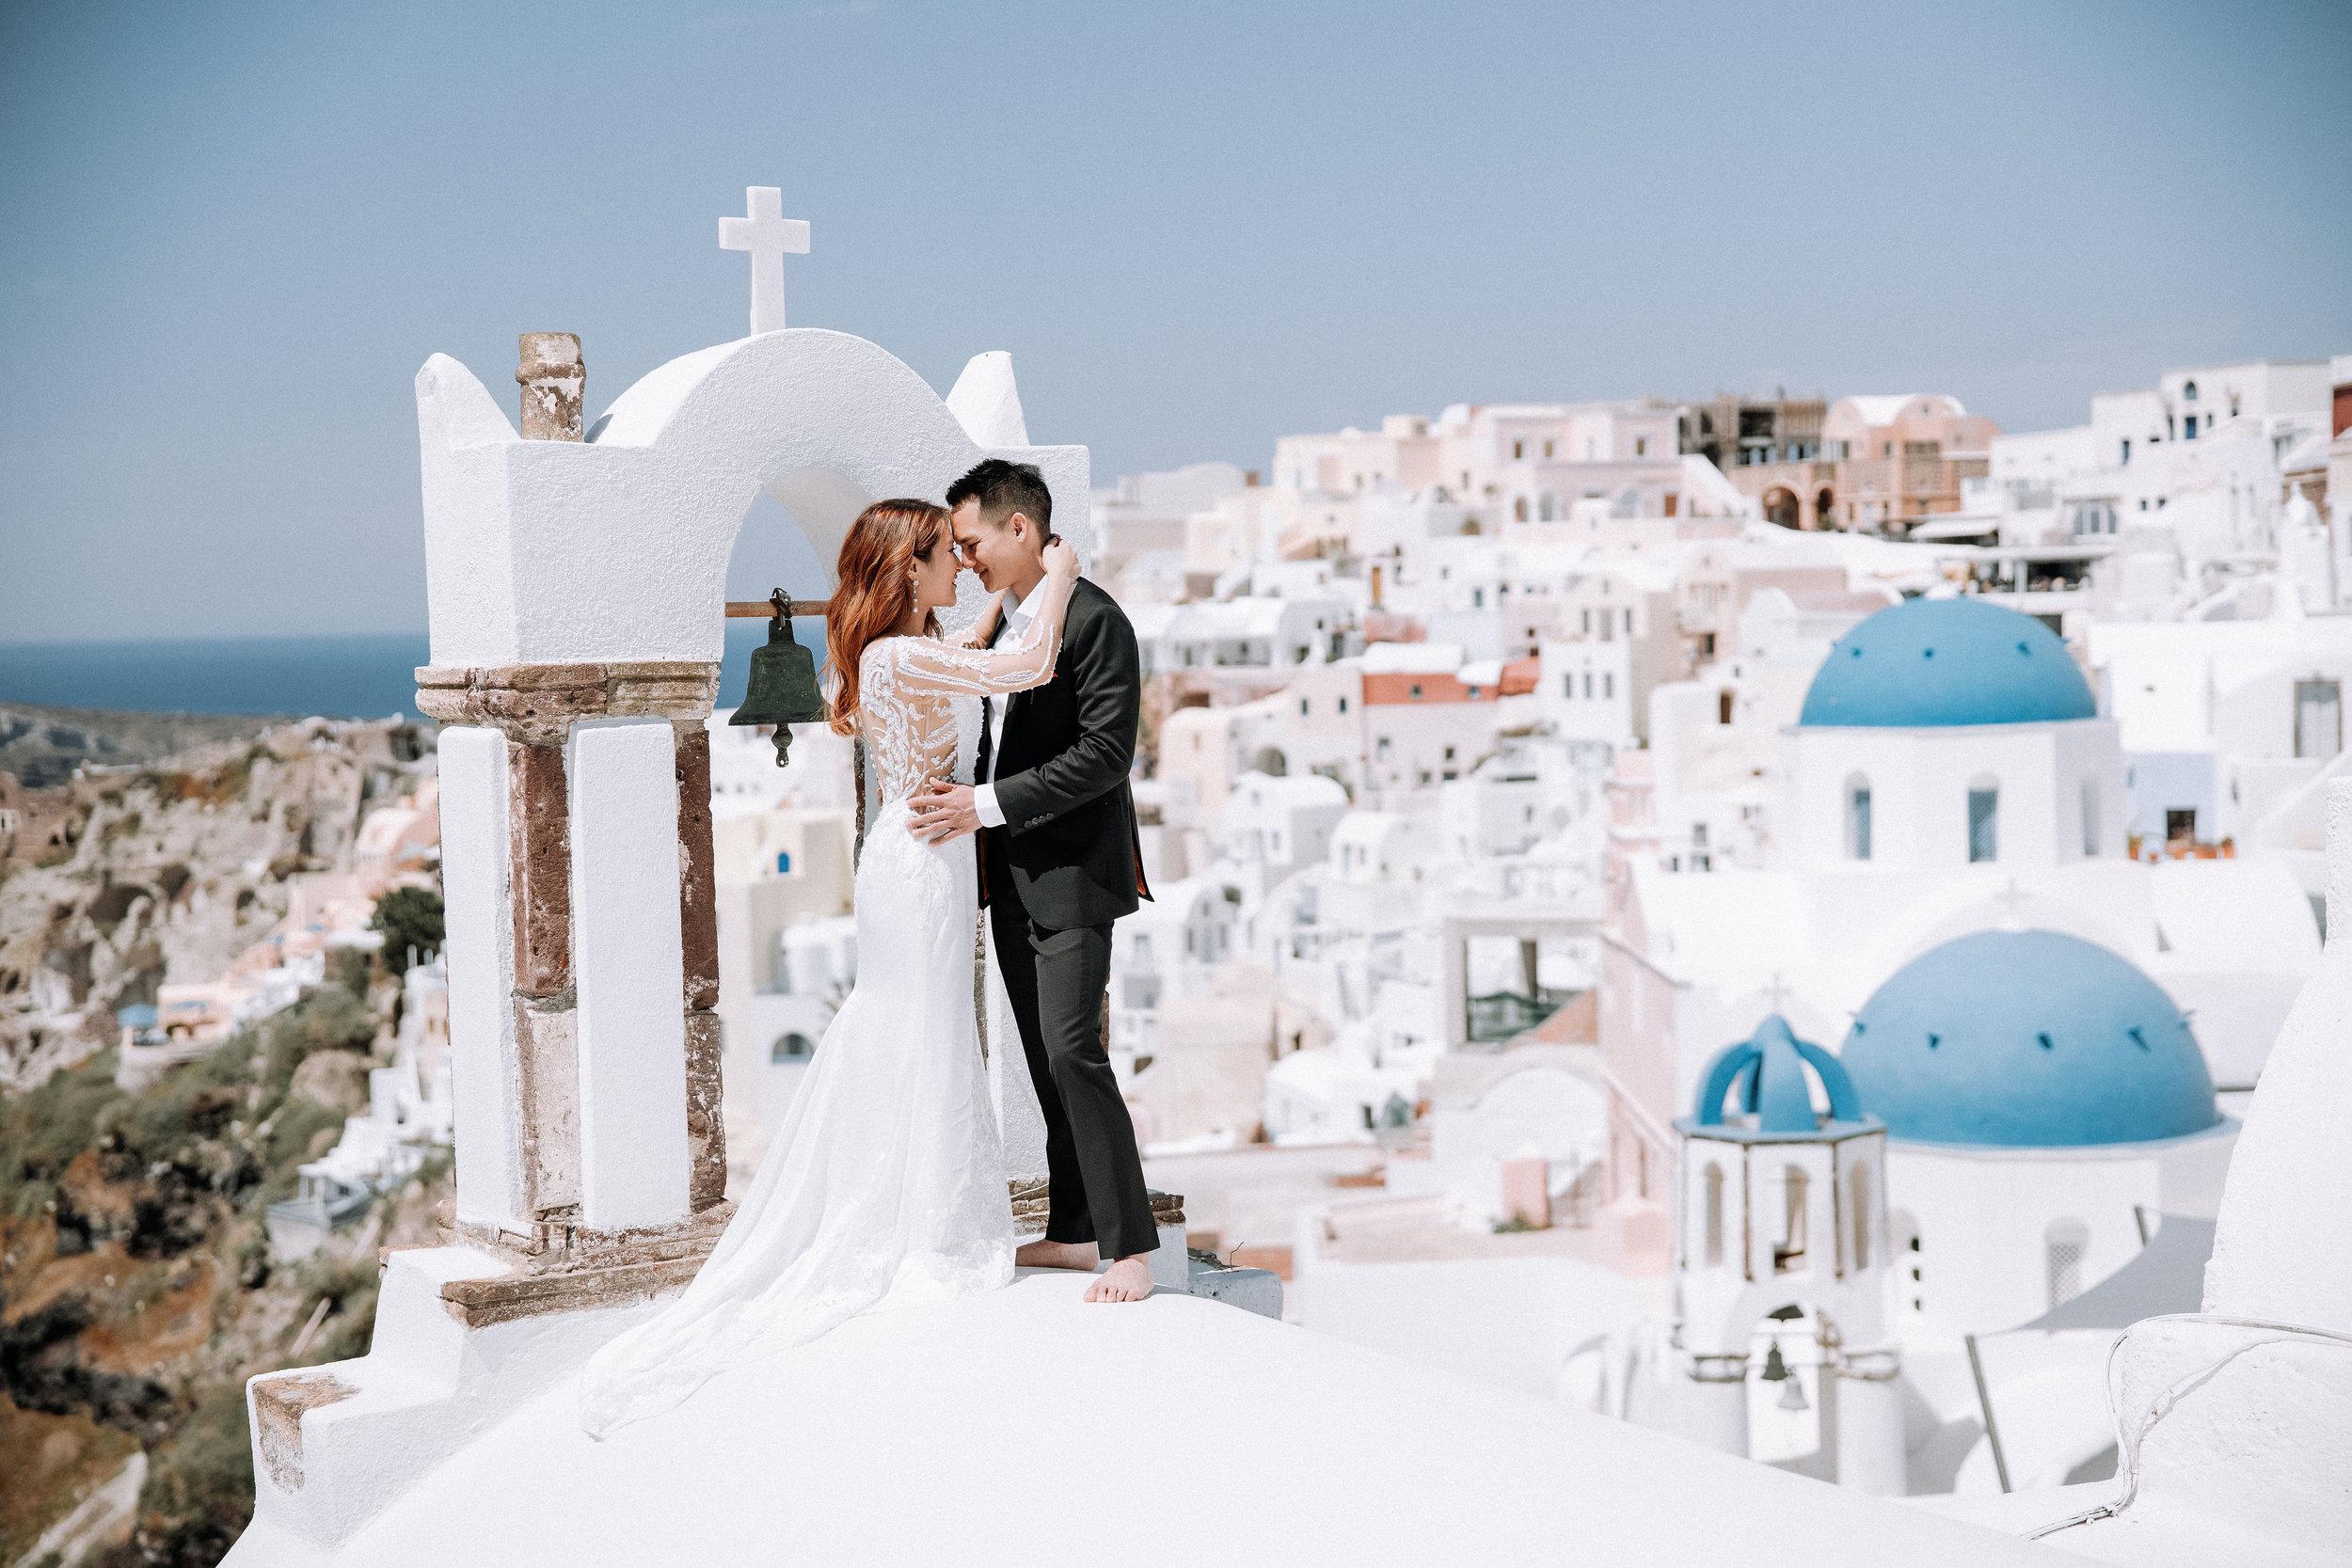 destination+pre+wedding+shoot+bride+groom+ccm.jpg